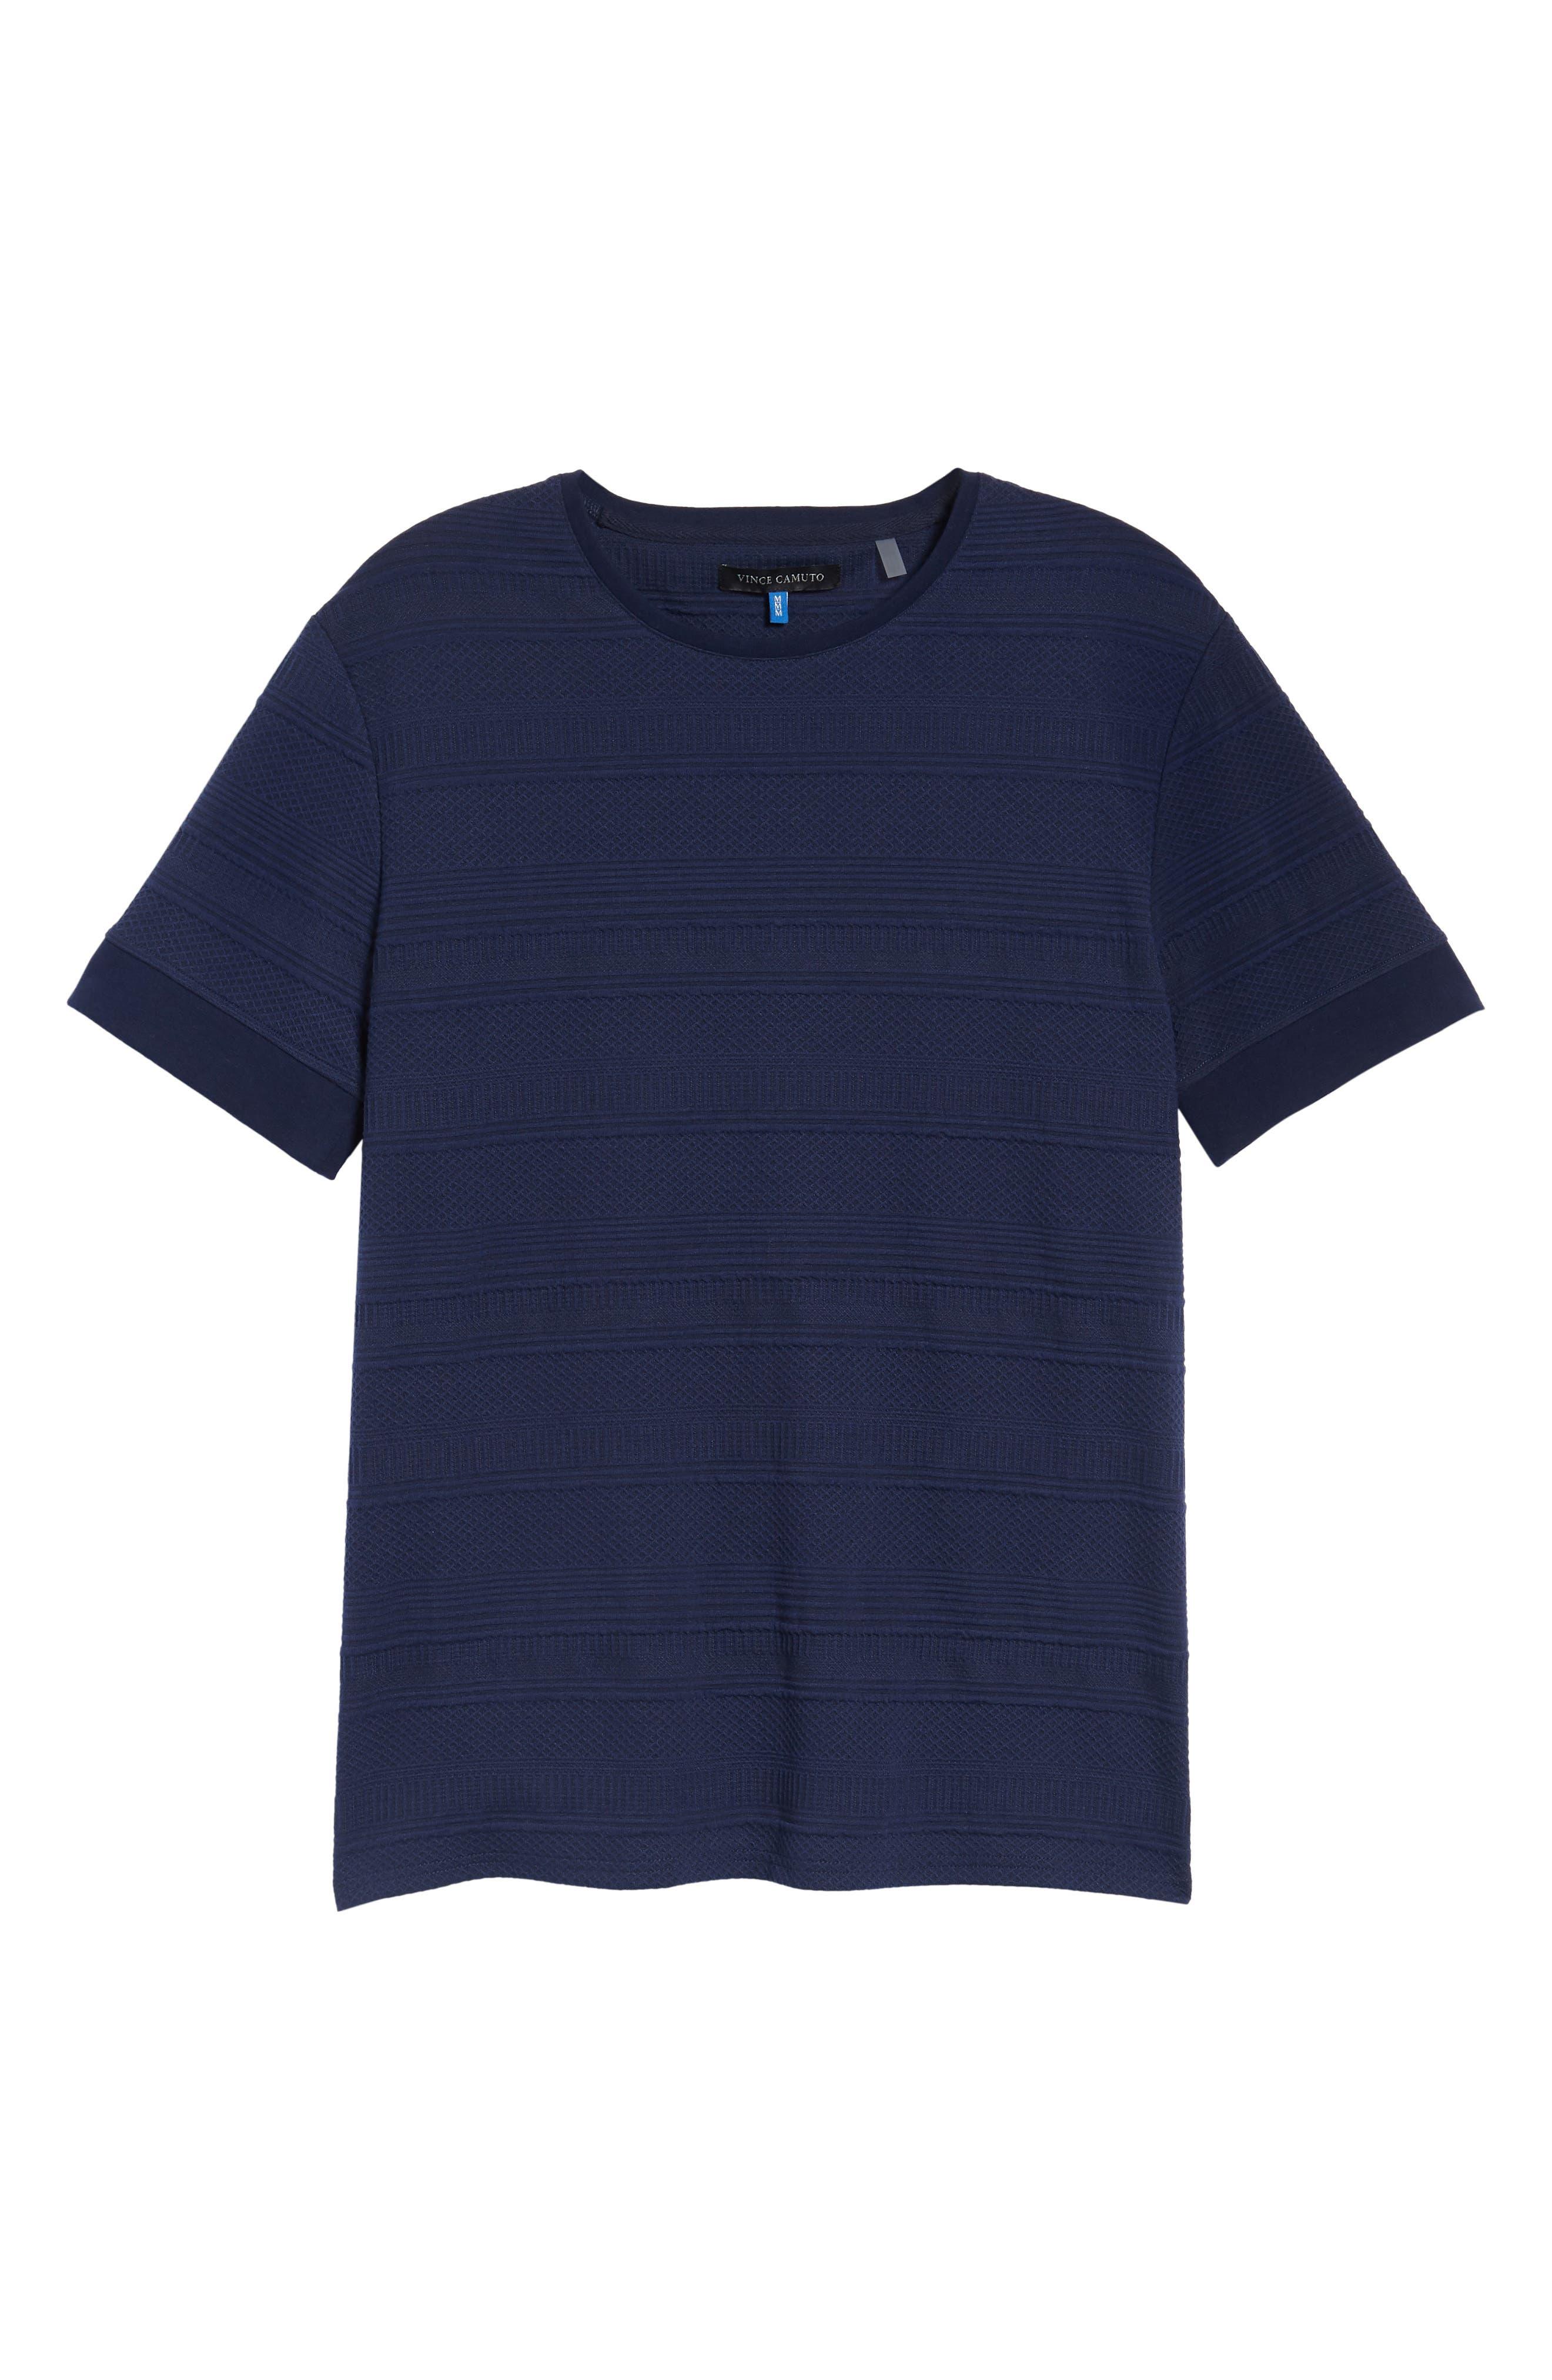 Banded Cuff Crewneck T-Shirt,                             Alternate thumbnail 6, color,                             Navy/Black